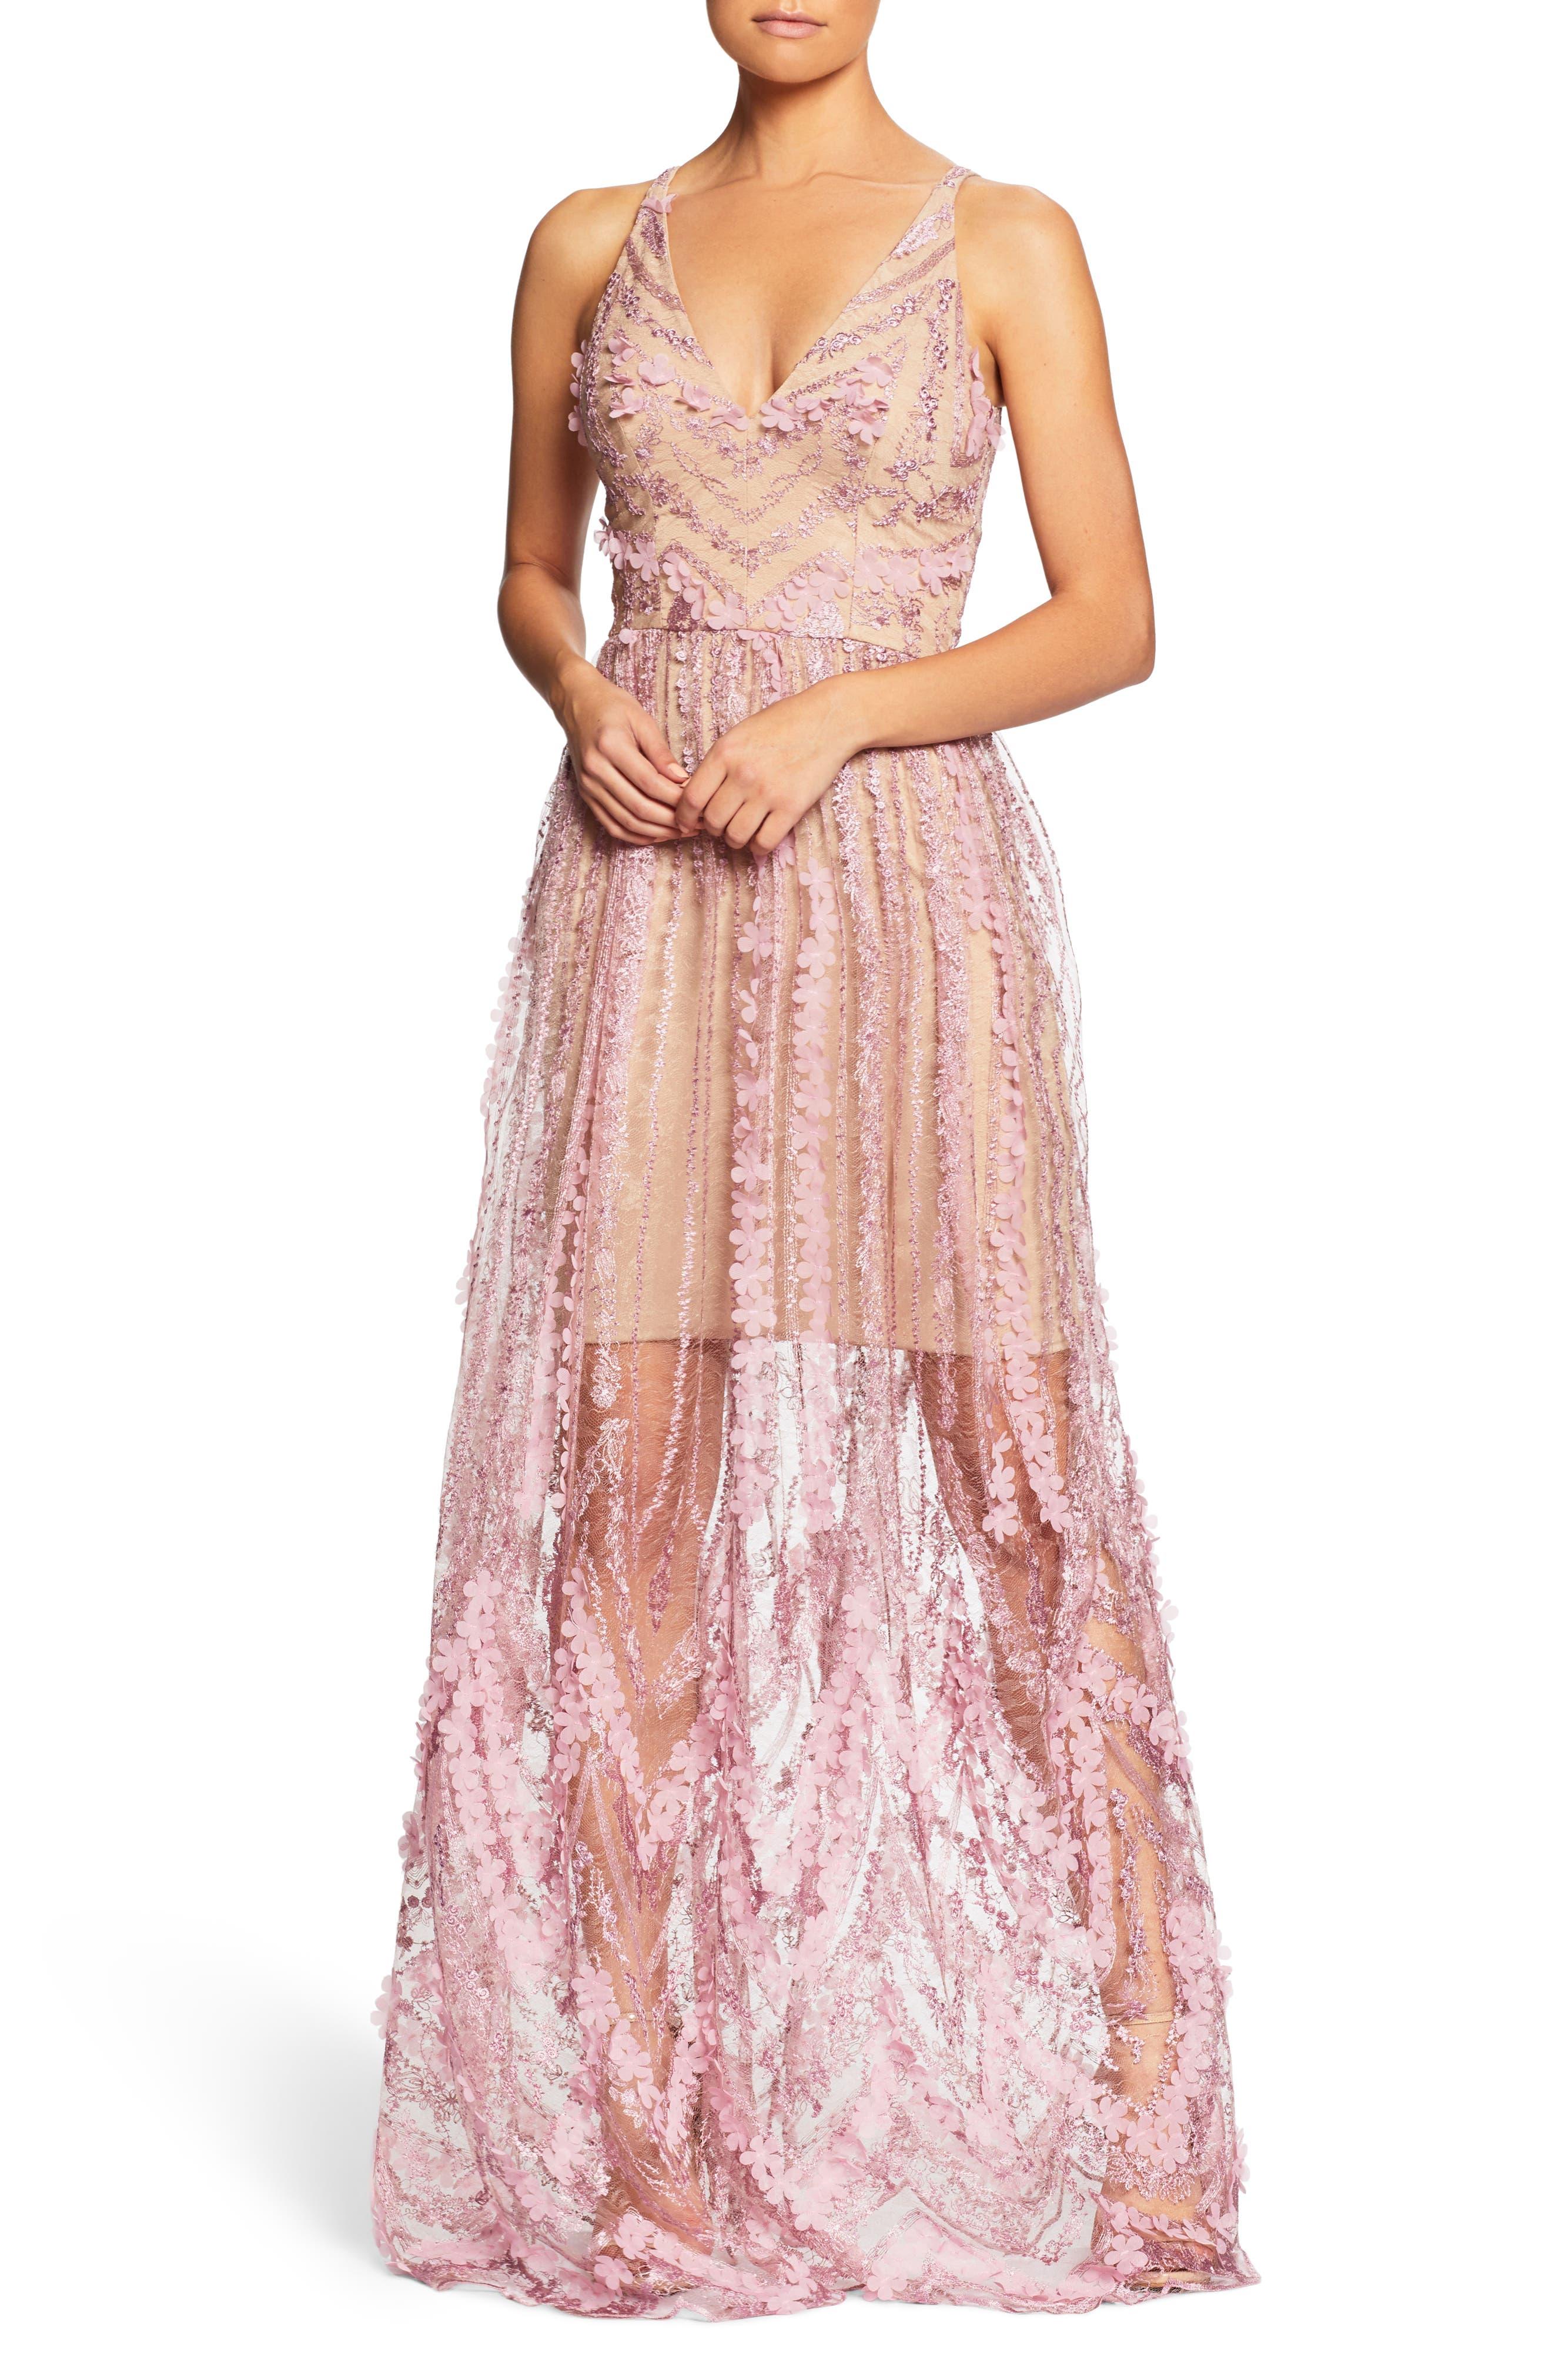 Laila lace panel peplum dress in white